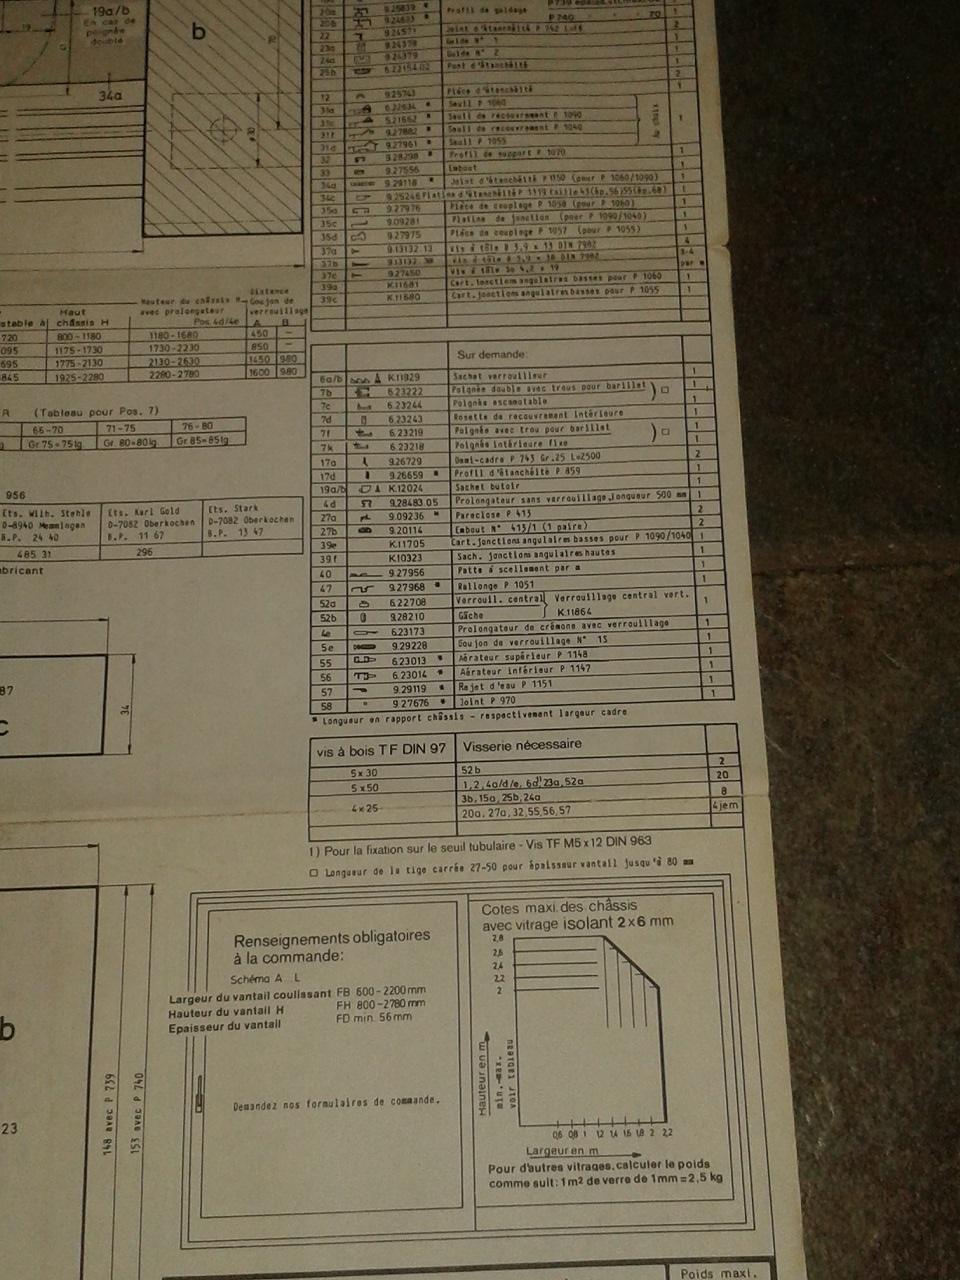 Fenêtres coulissantes - Page 2 B1yo4t_20140507_234438